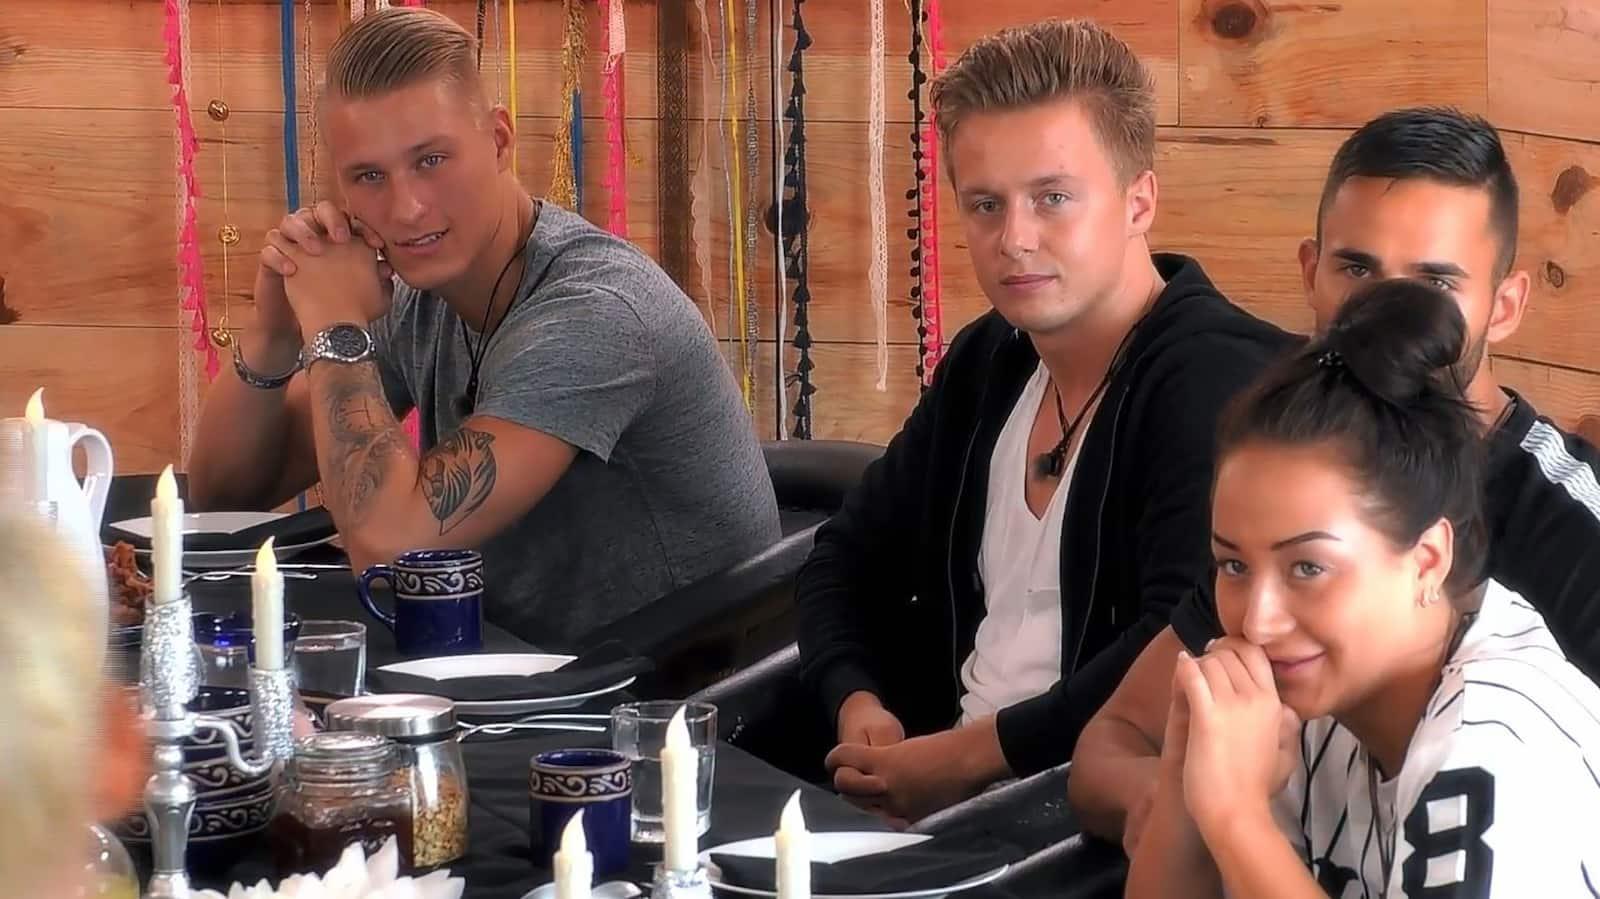 Romantisk dejt massage bromma svenska amatrse